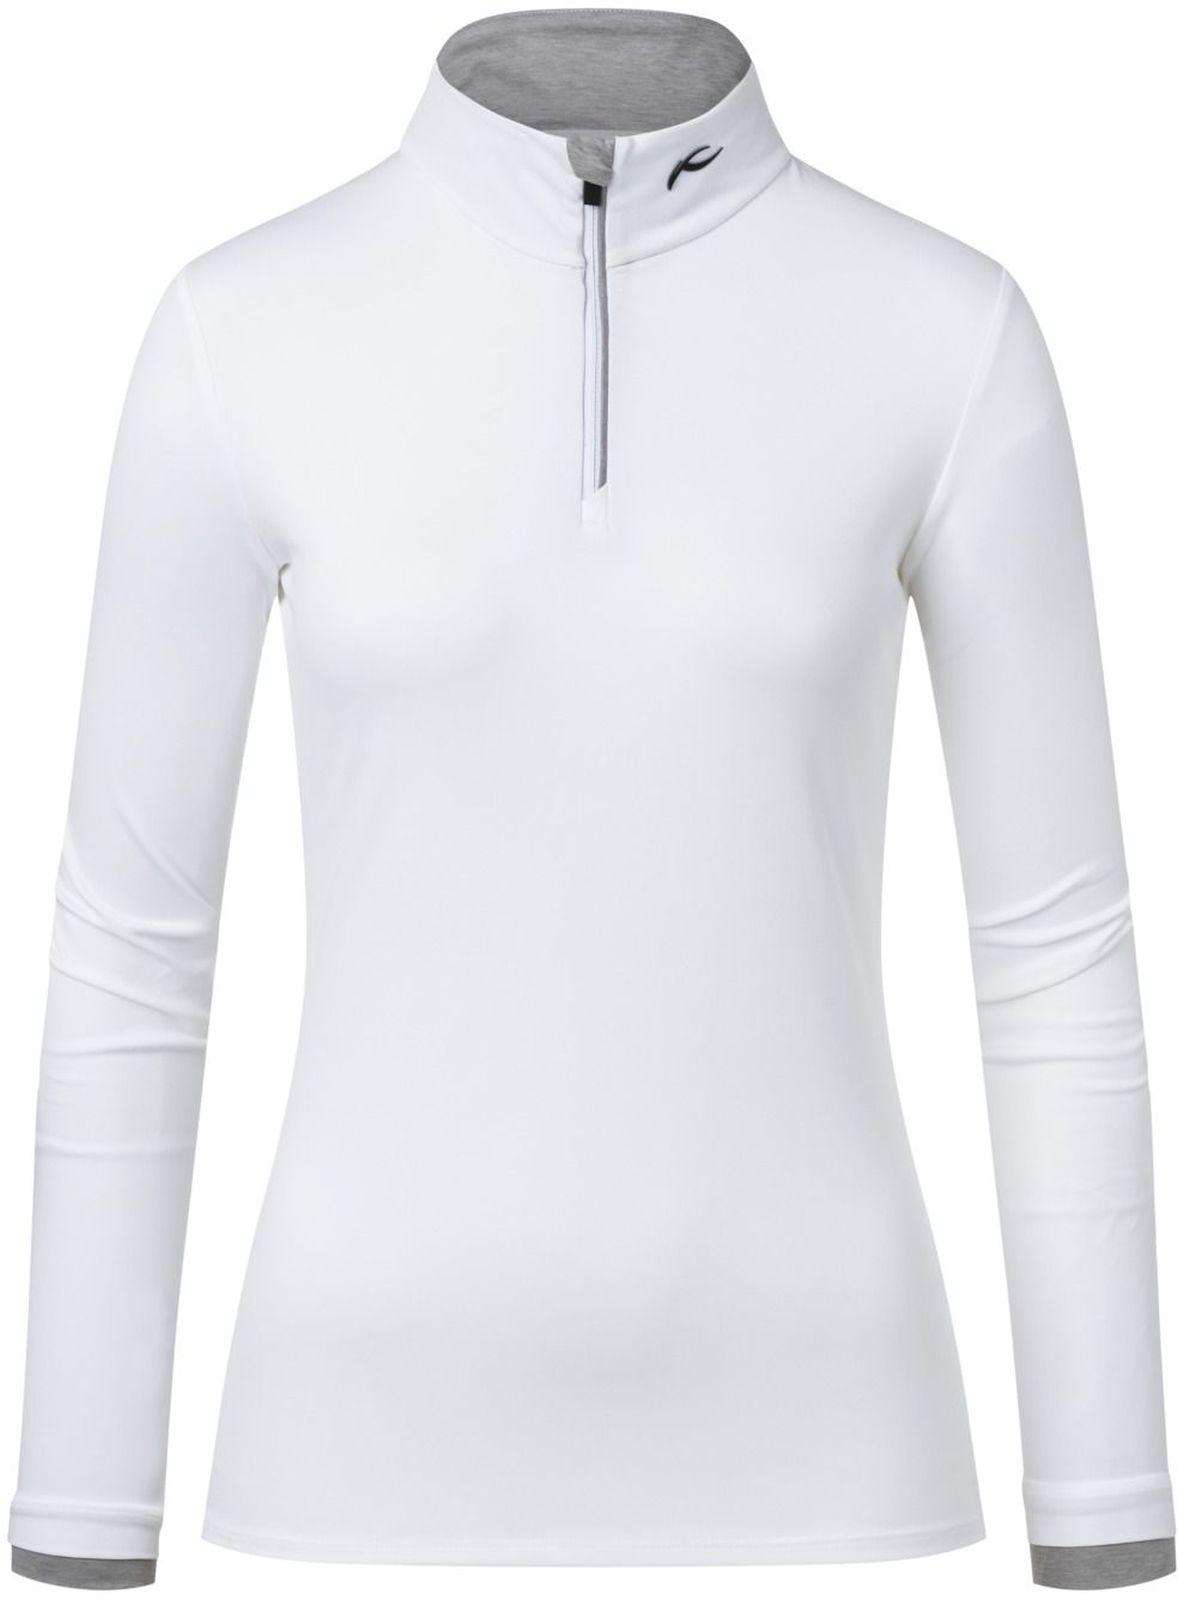 Dámská mikina Kjus Women Feel Halfzip - white - Ski a Bike Centrum ... ec23346e992